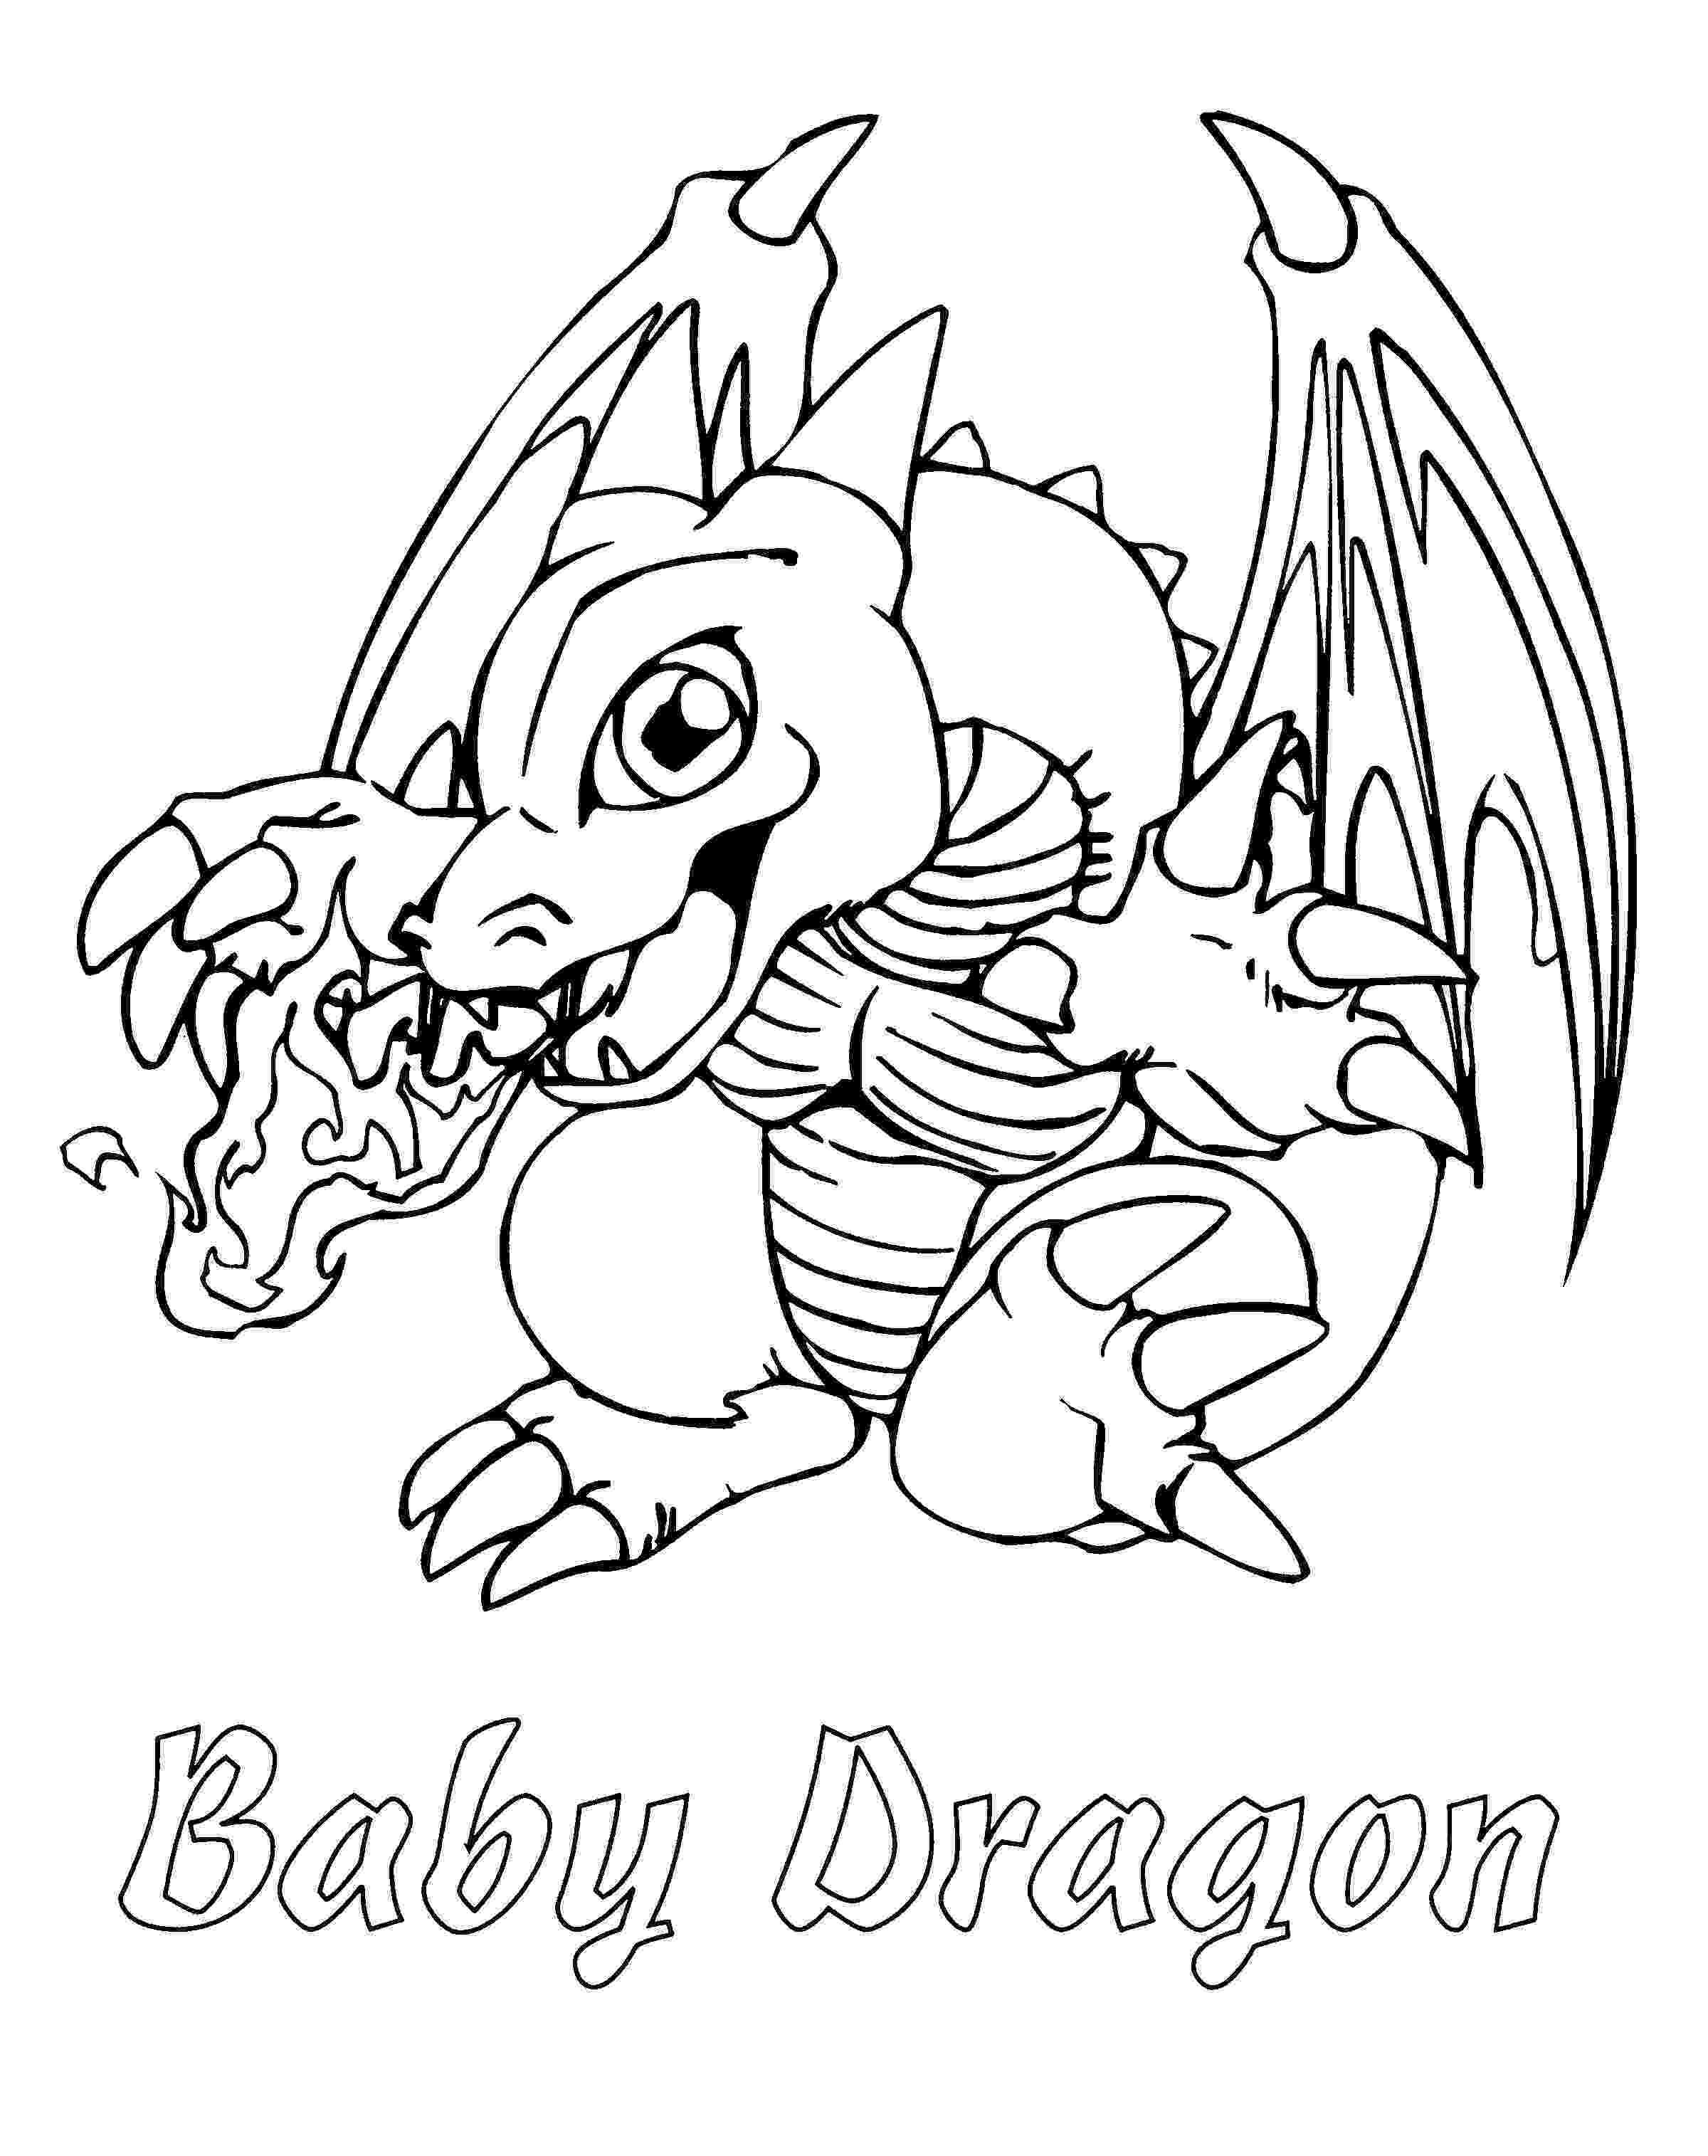 dragon color sheets blog creation2 free printable animal dragon coloring pages sheets dragon color